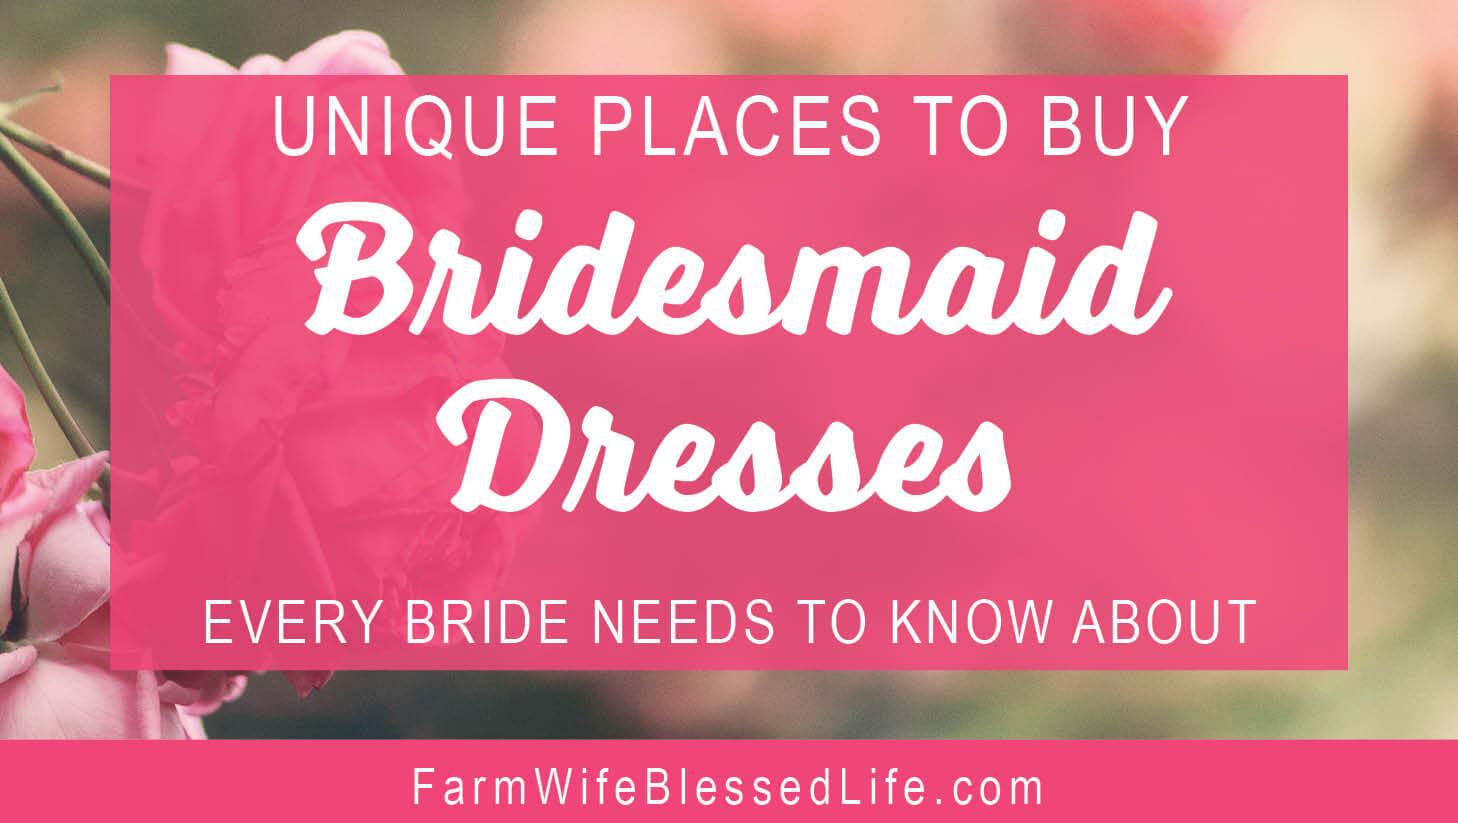 Unique places to buy bridesmaid dresses every bride needs to know unique places to buy bridesmaids dresses ombrellifo Choice Image